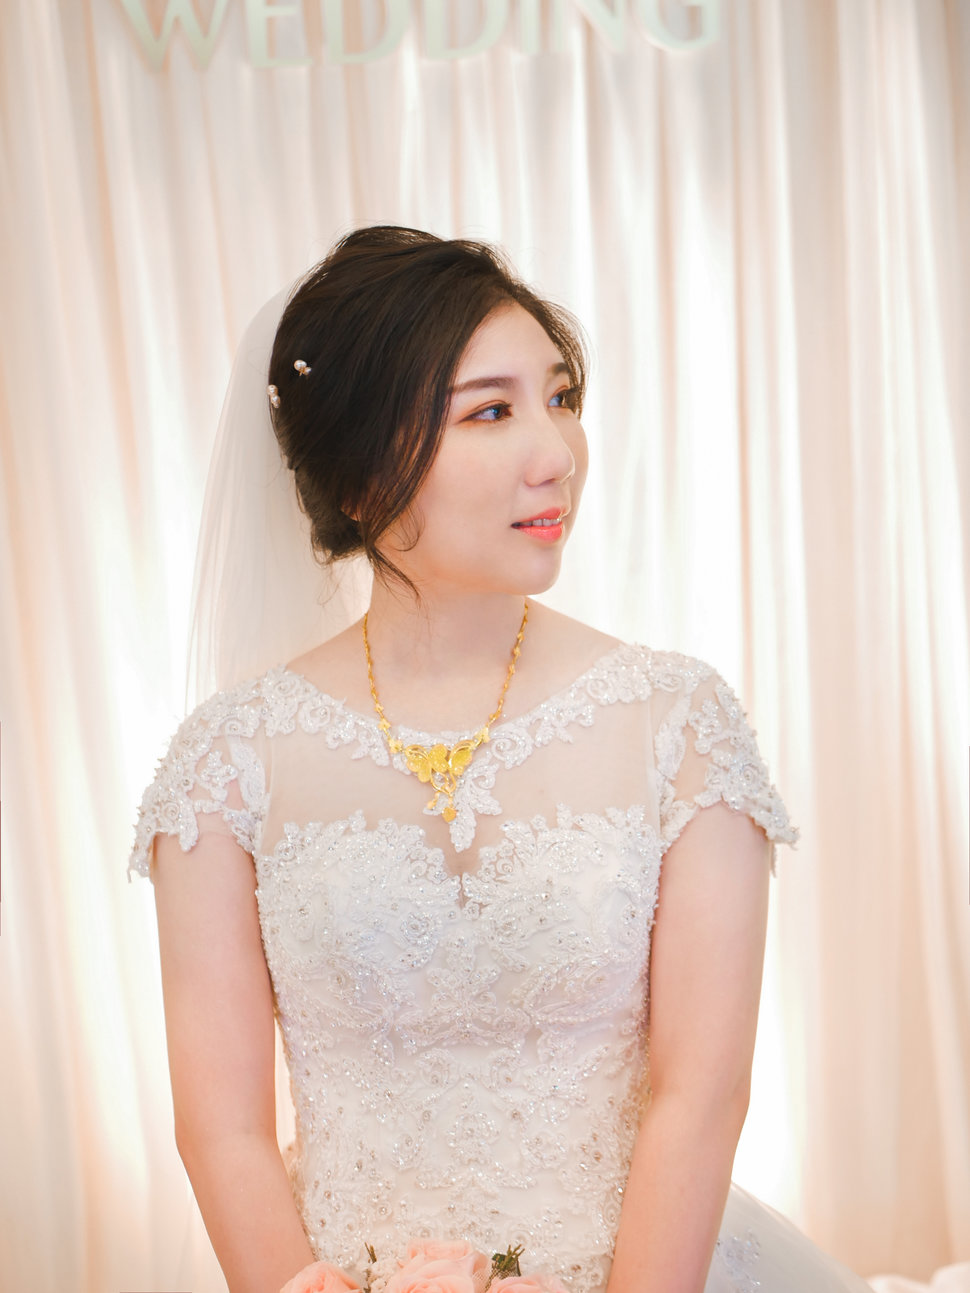 A560BC48-C652-4CE2-AA0E-4A80BBFB79B3 - Lulu盧葦青《結婚吧》